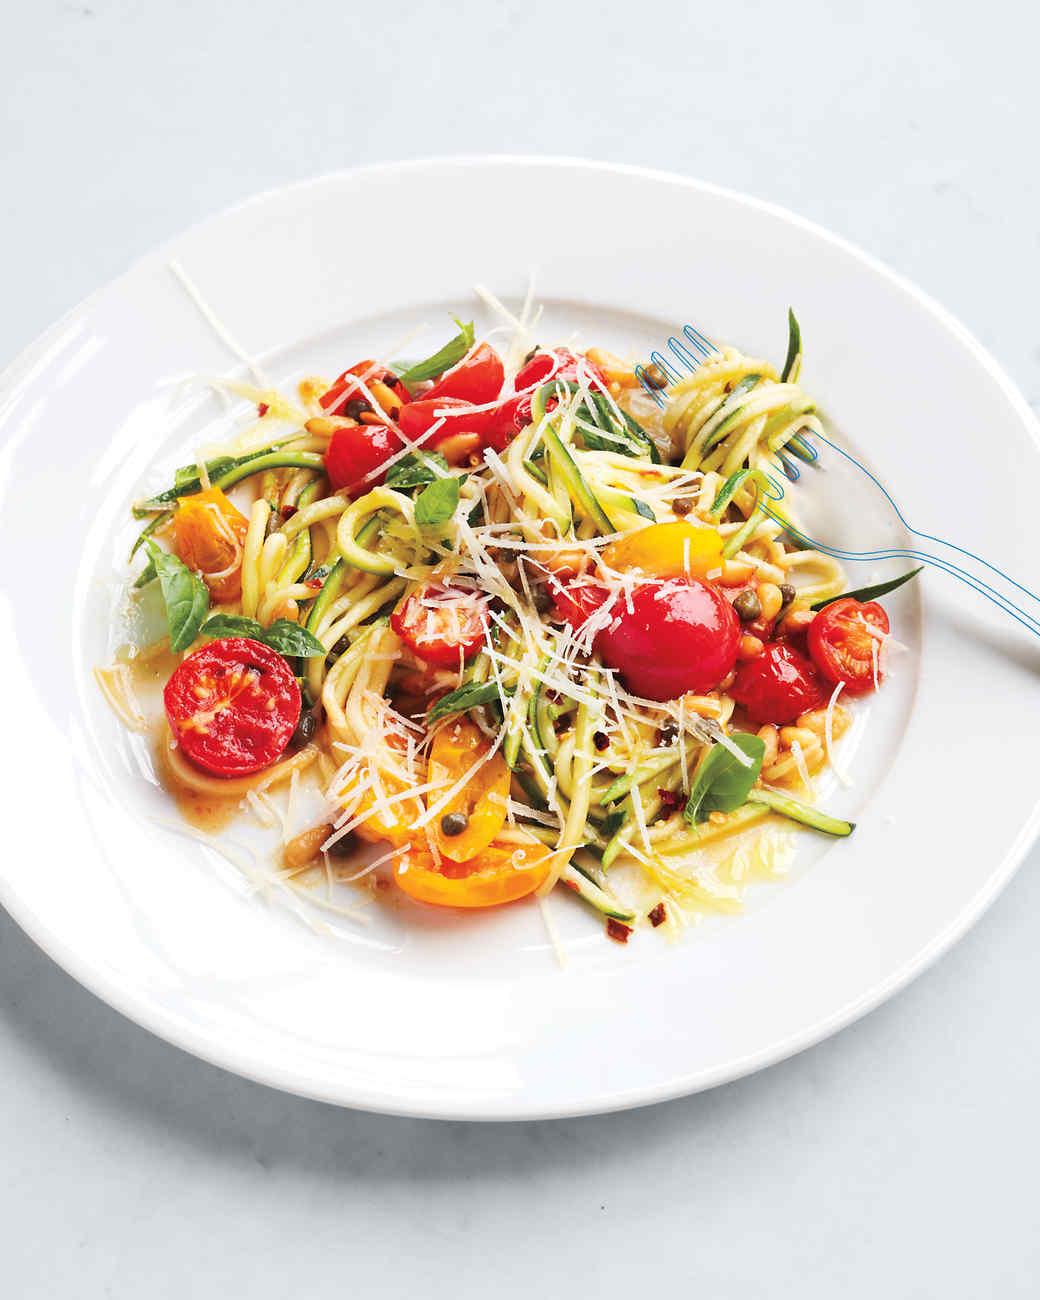 zucchini-pasta-primavera-097-d111891.jpg